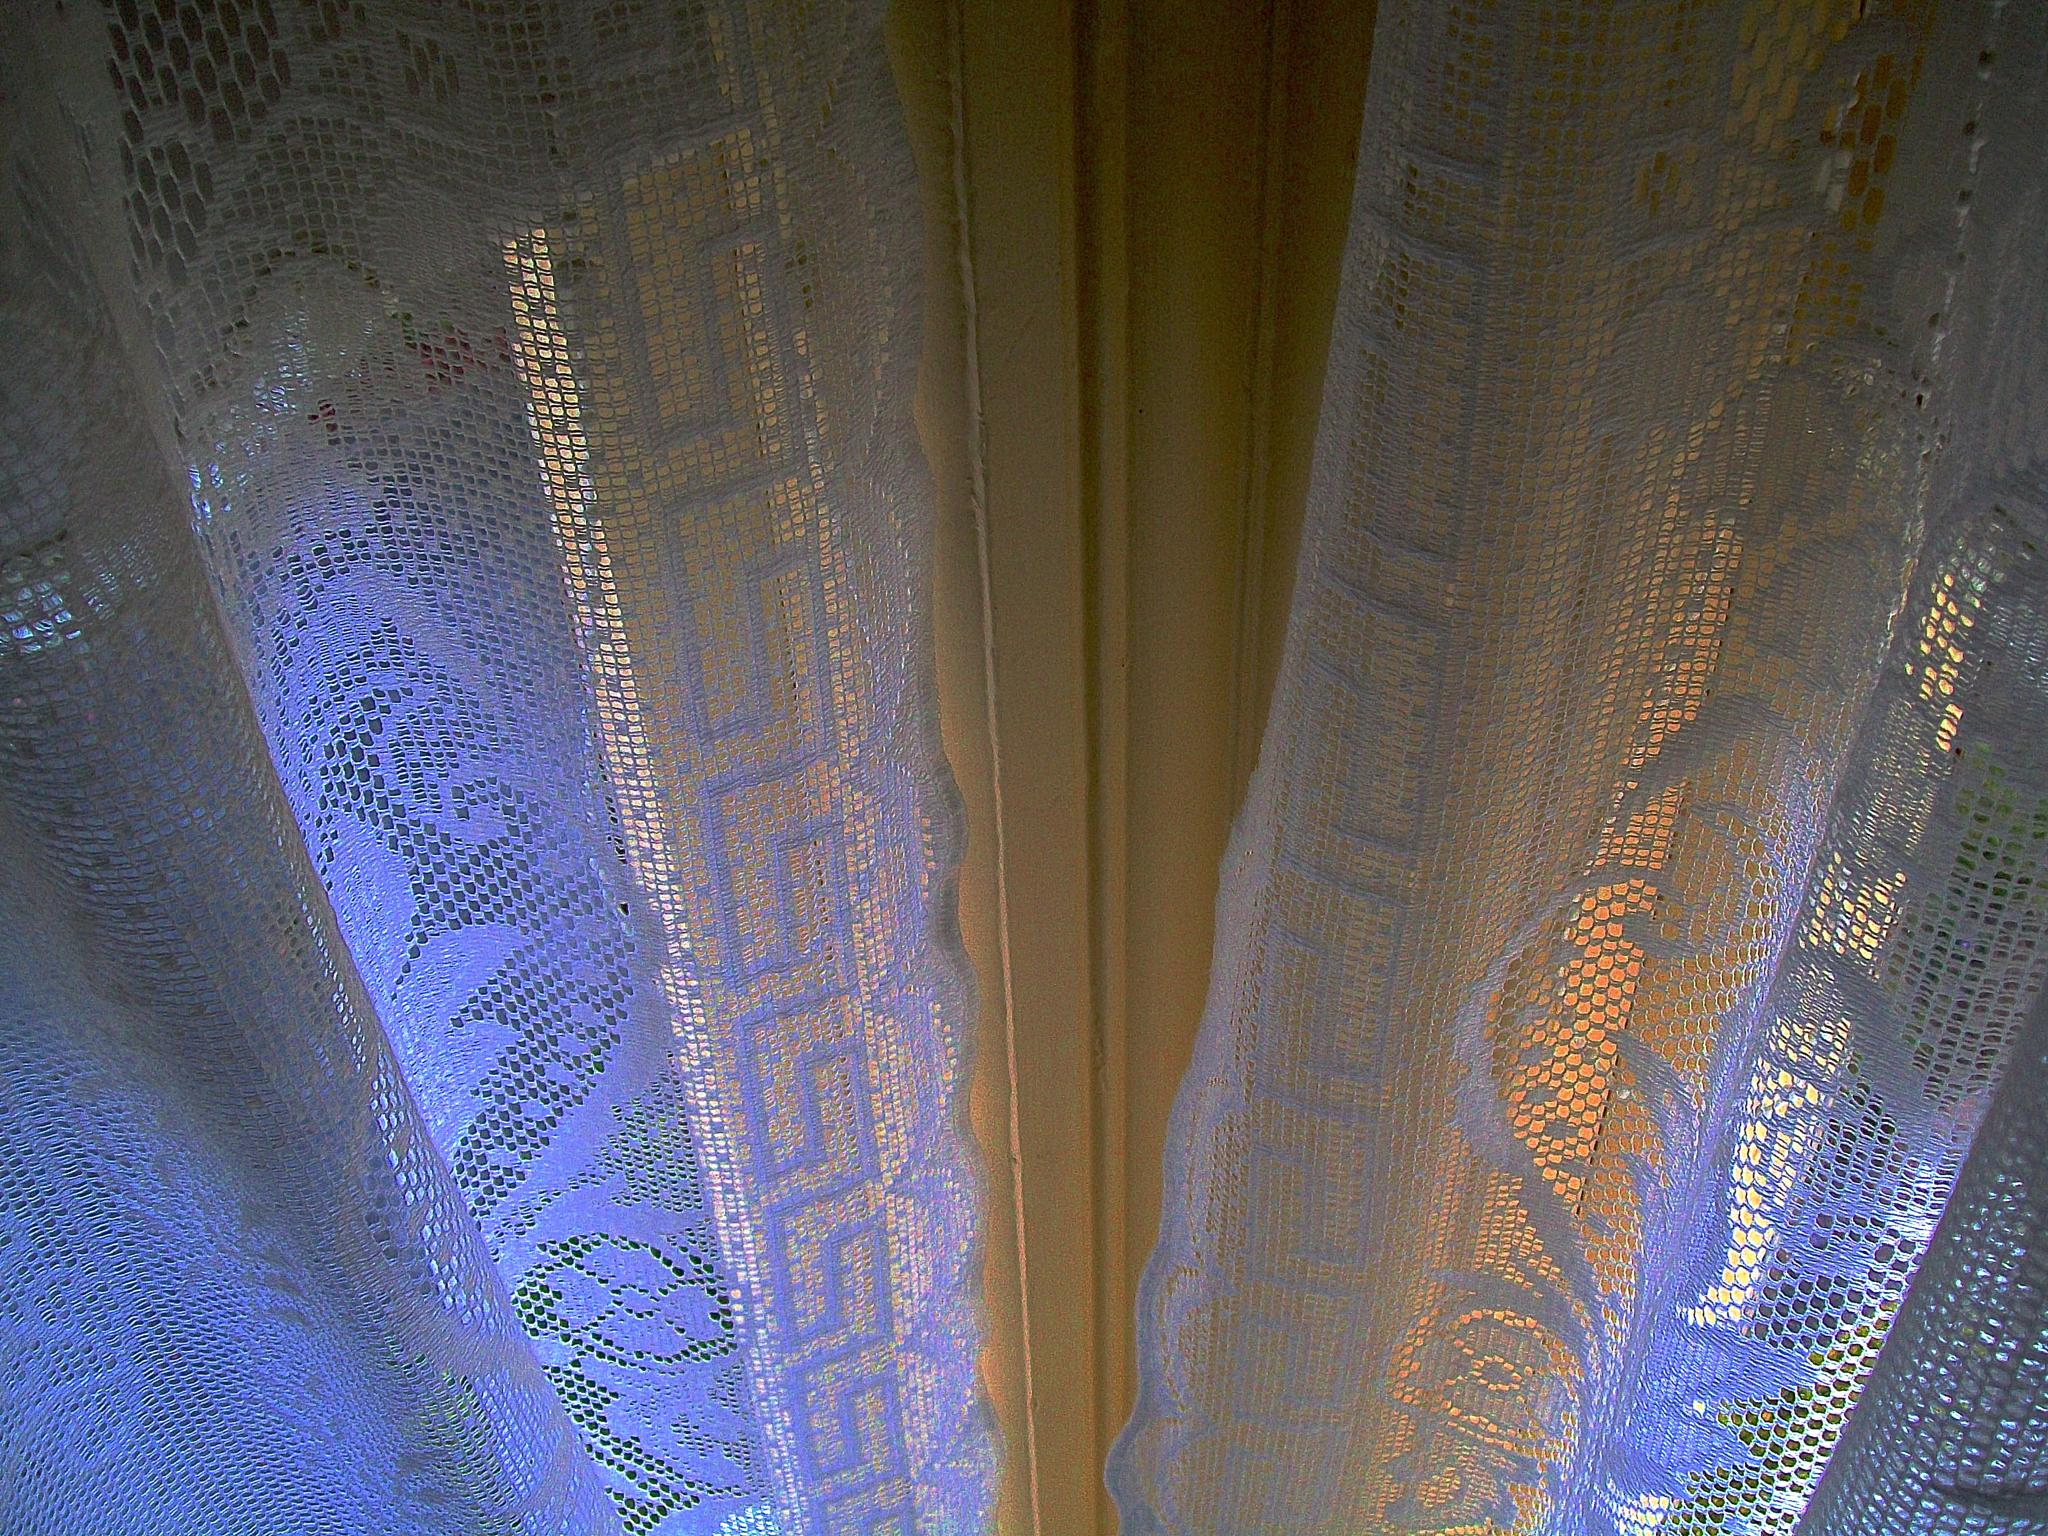 Ferndale Lace Curtains #1 by John Norman Stewart